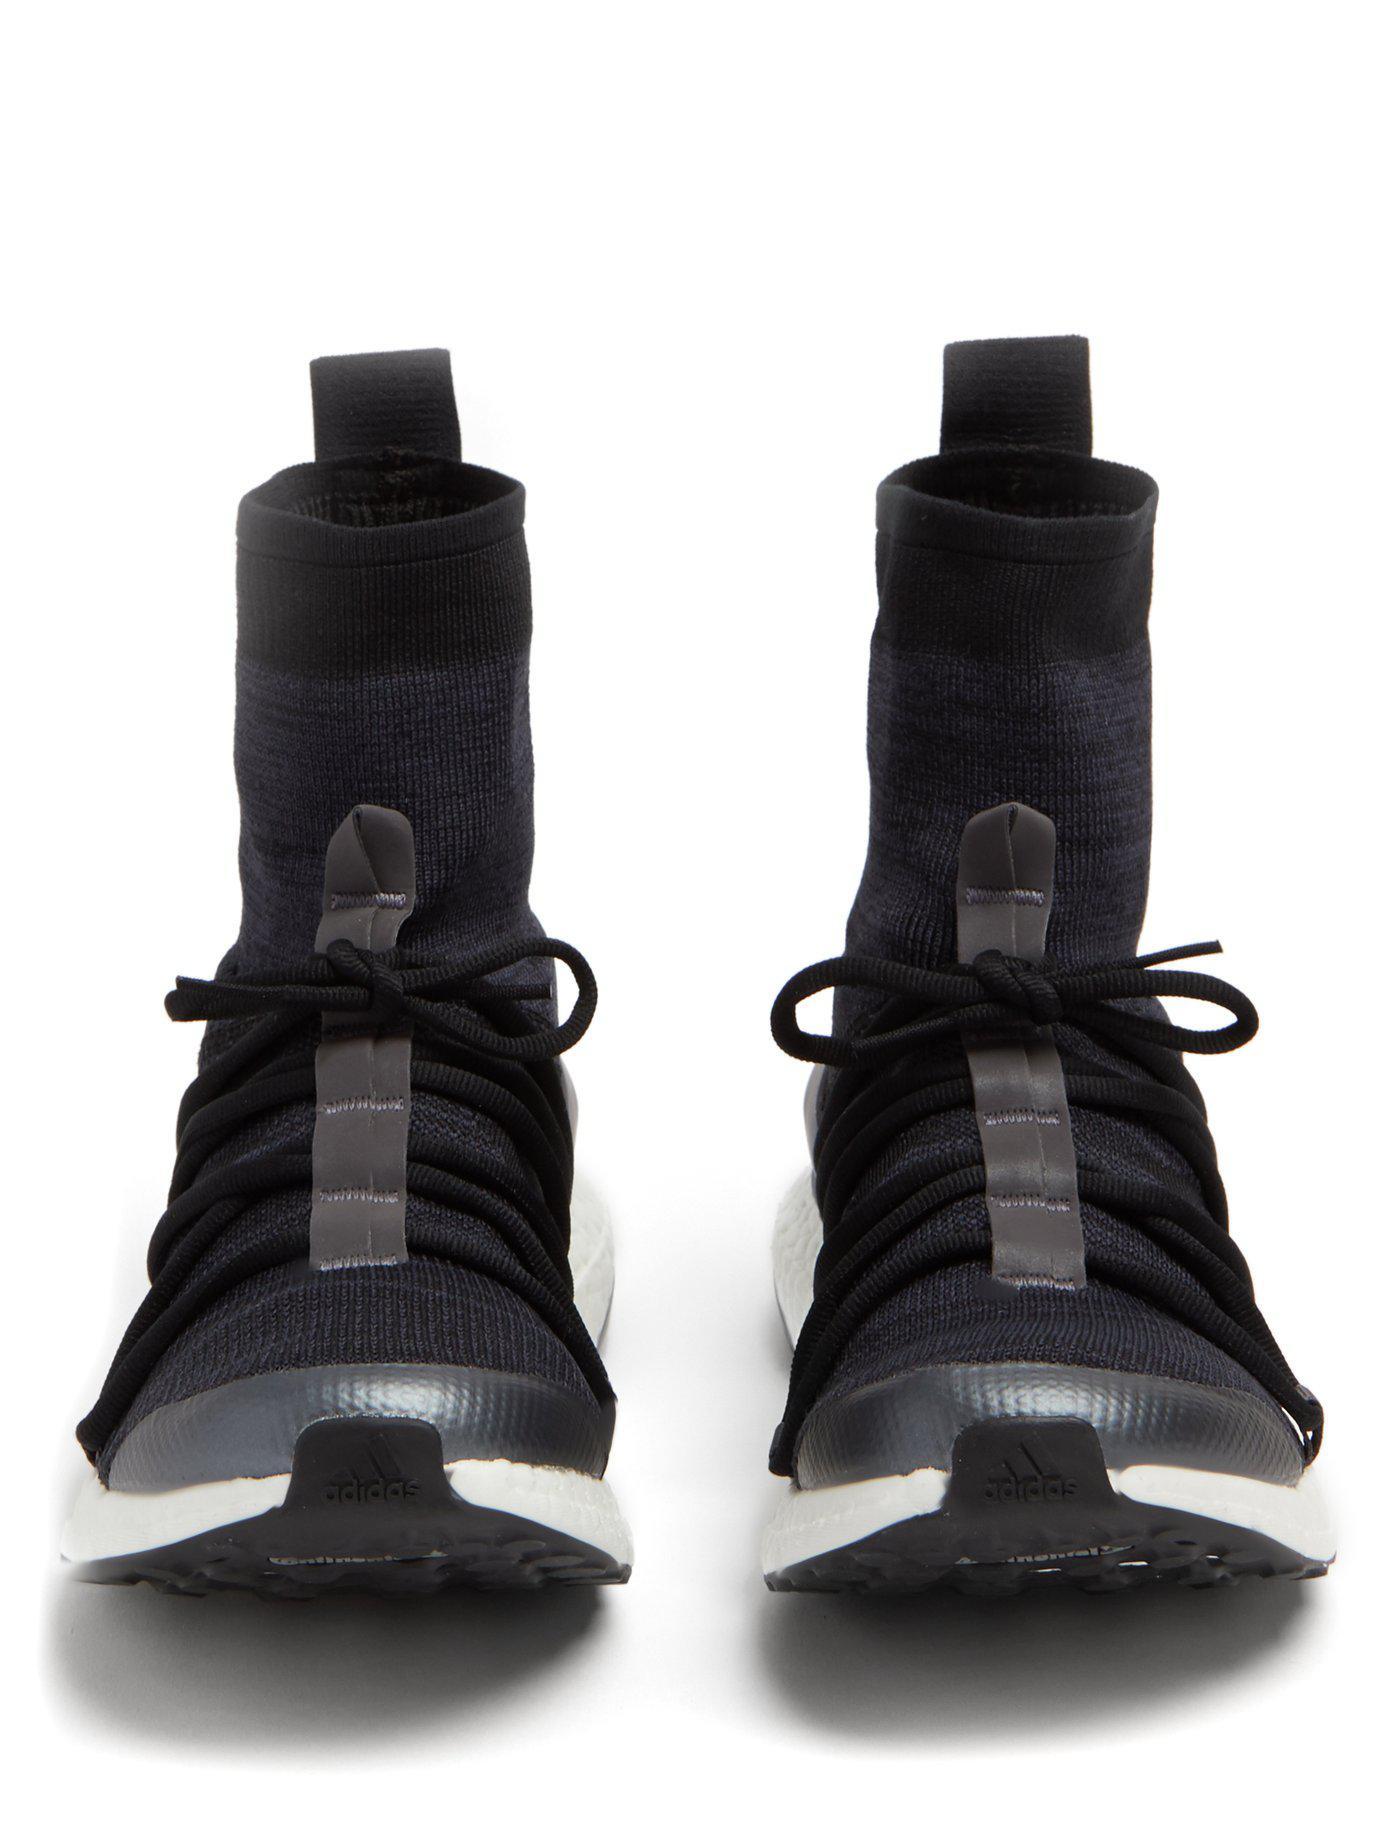 By Vwmny80on Chaussettes Ultra Montantes Boost X Baskets Adidas Stella lT3FK1Jc